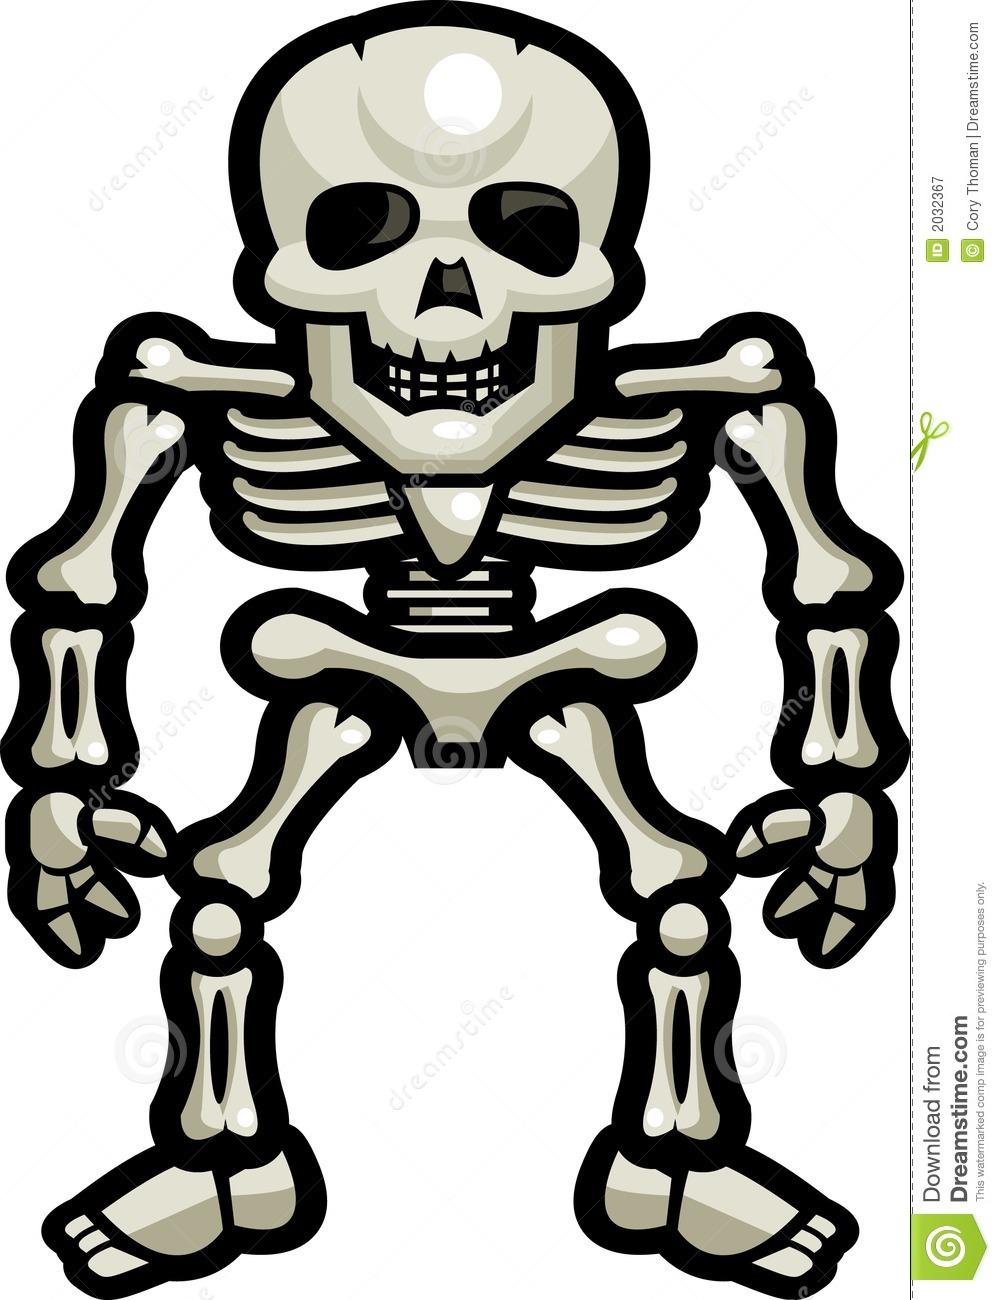 Bones clipart skeleton. Human free download best